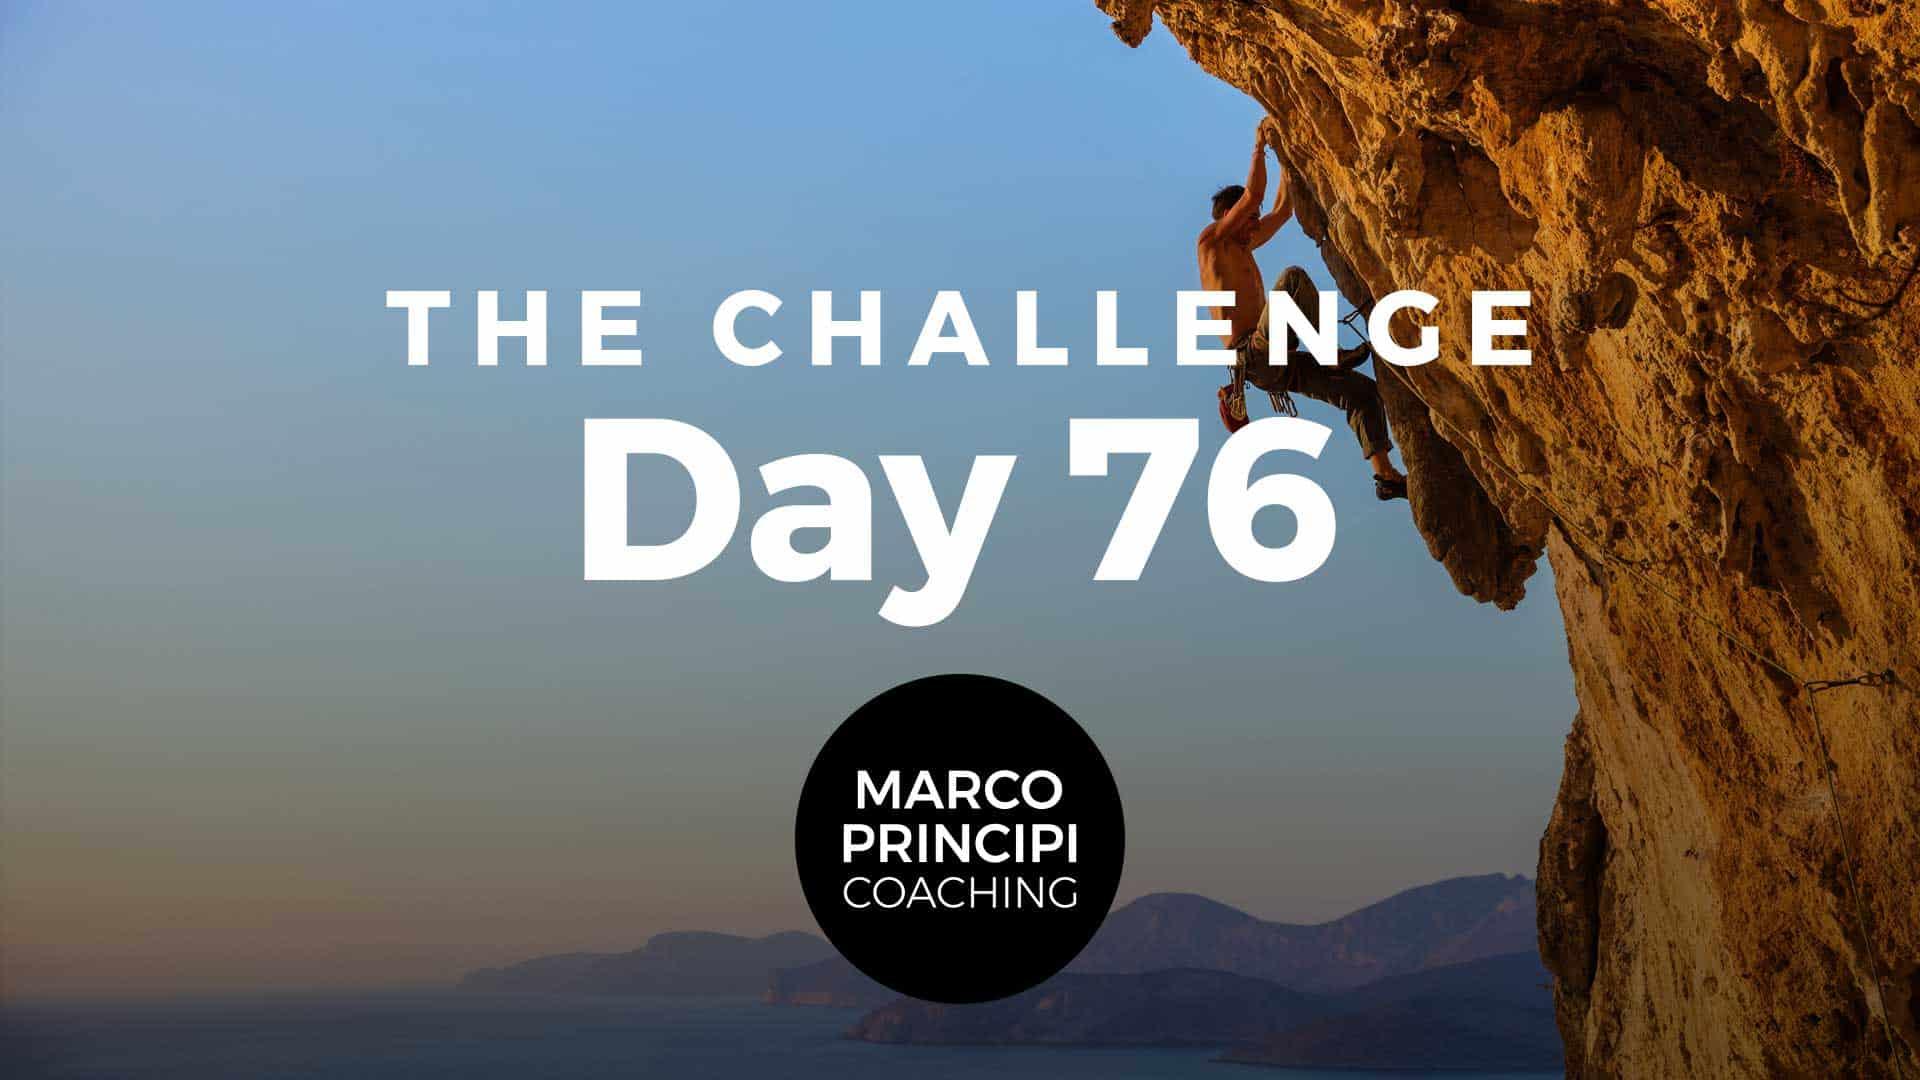 Marco Principi Coaching Challenge Day 76